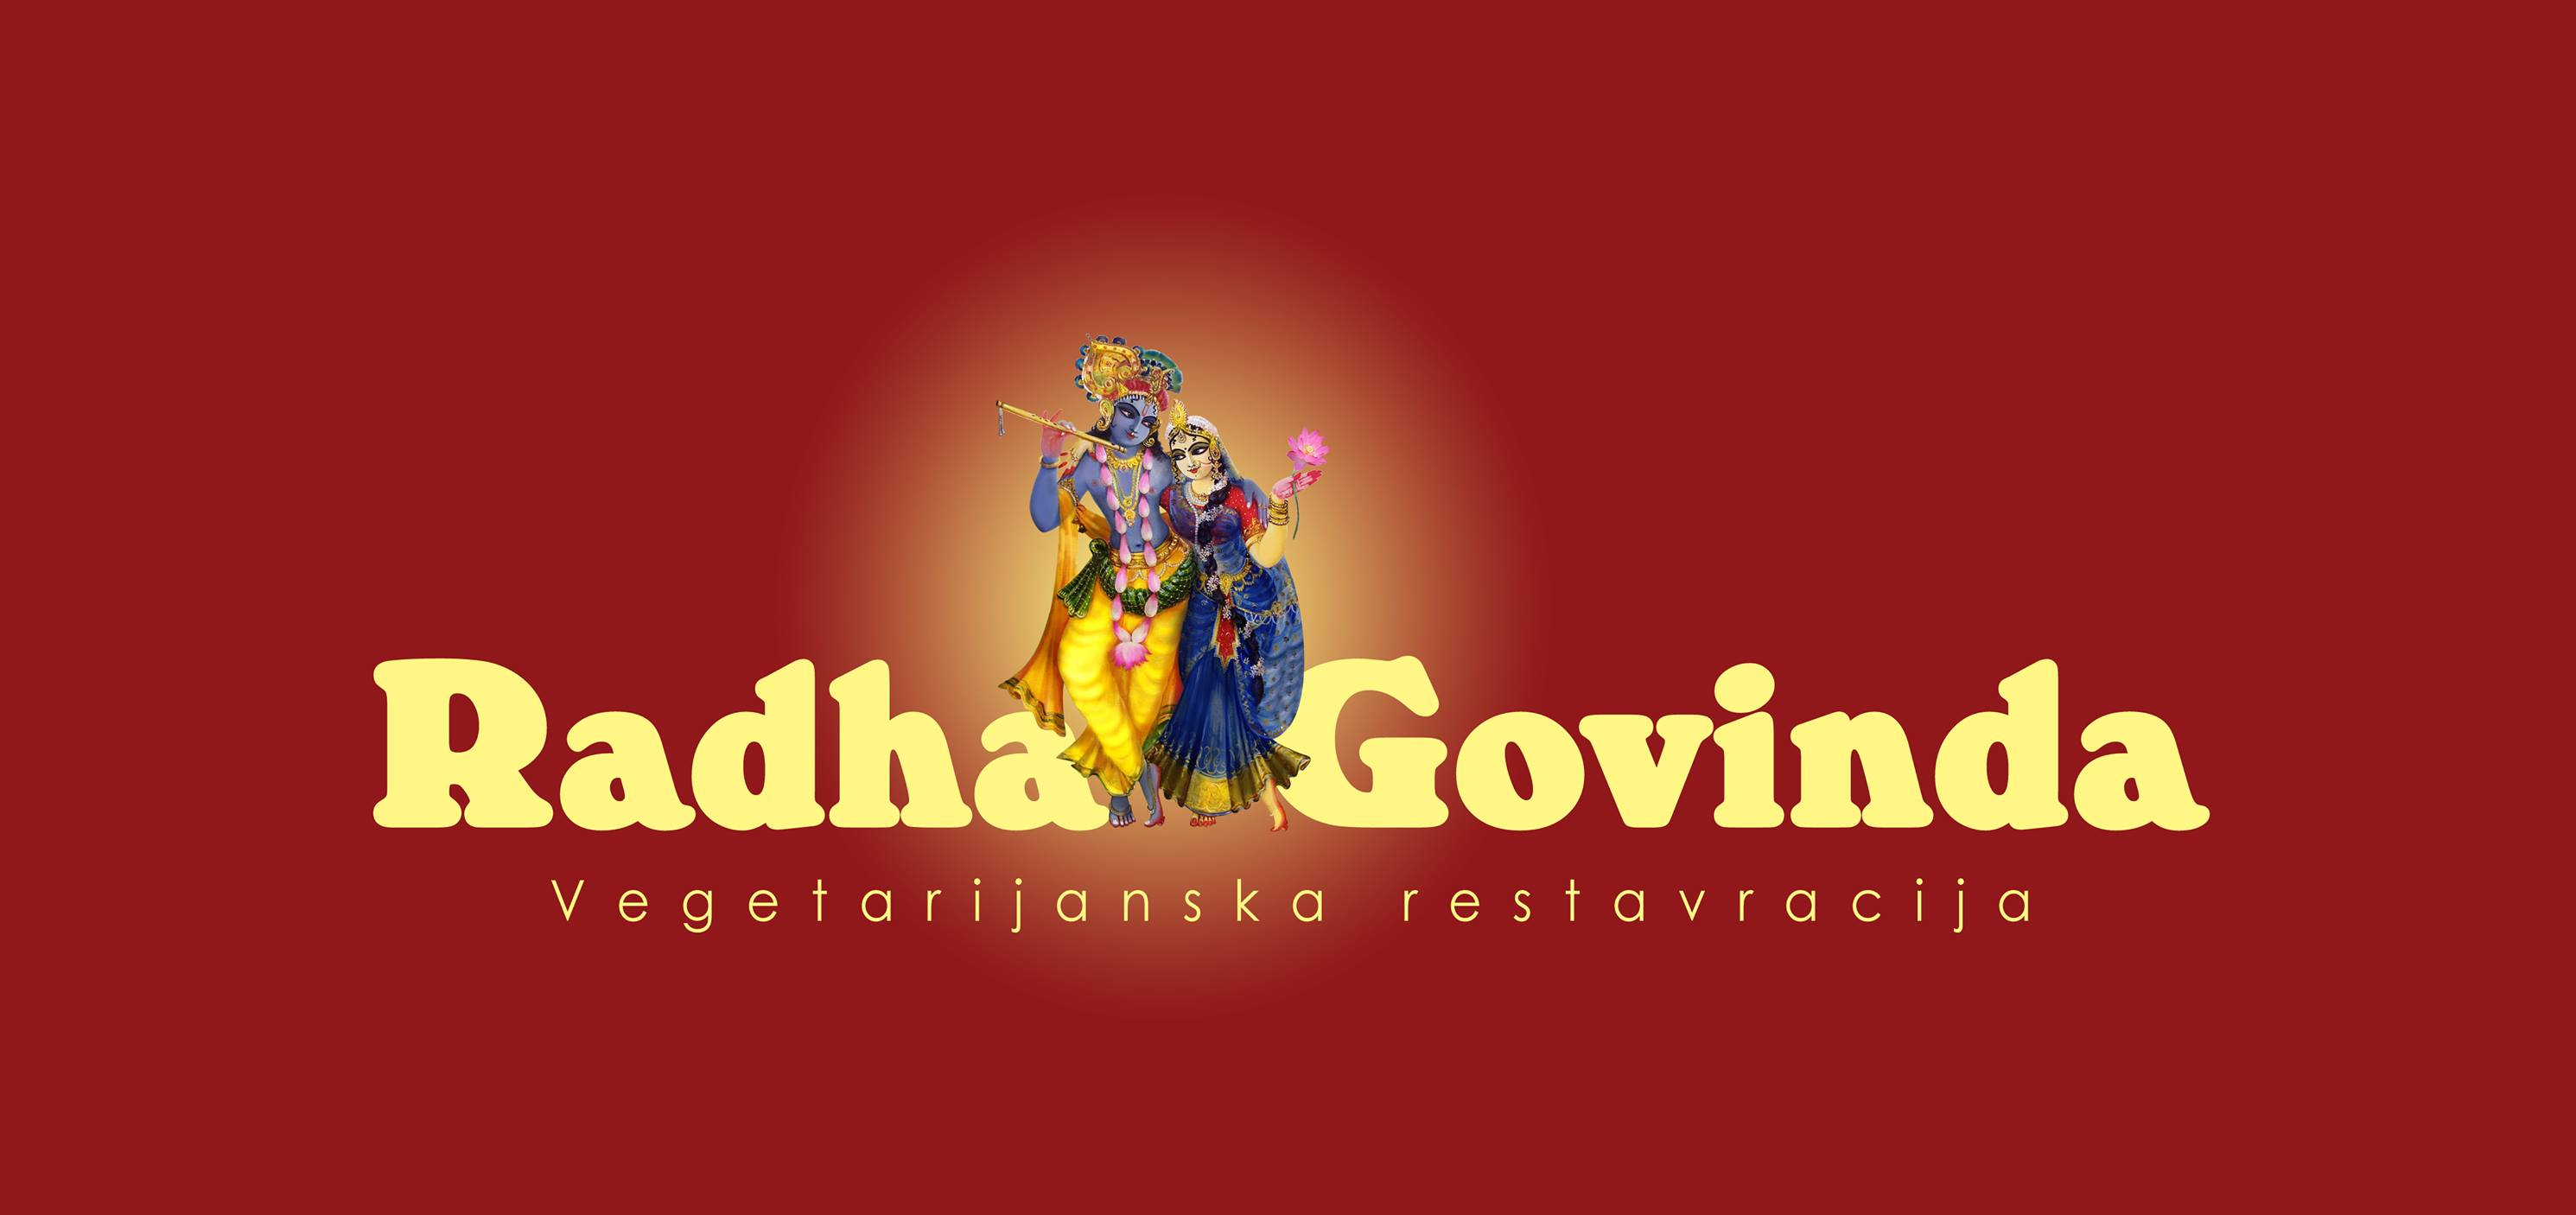 Radha Govinda - Street food btc